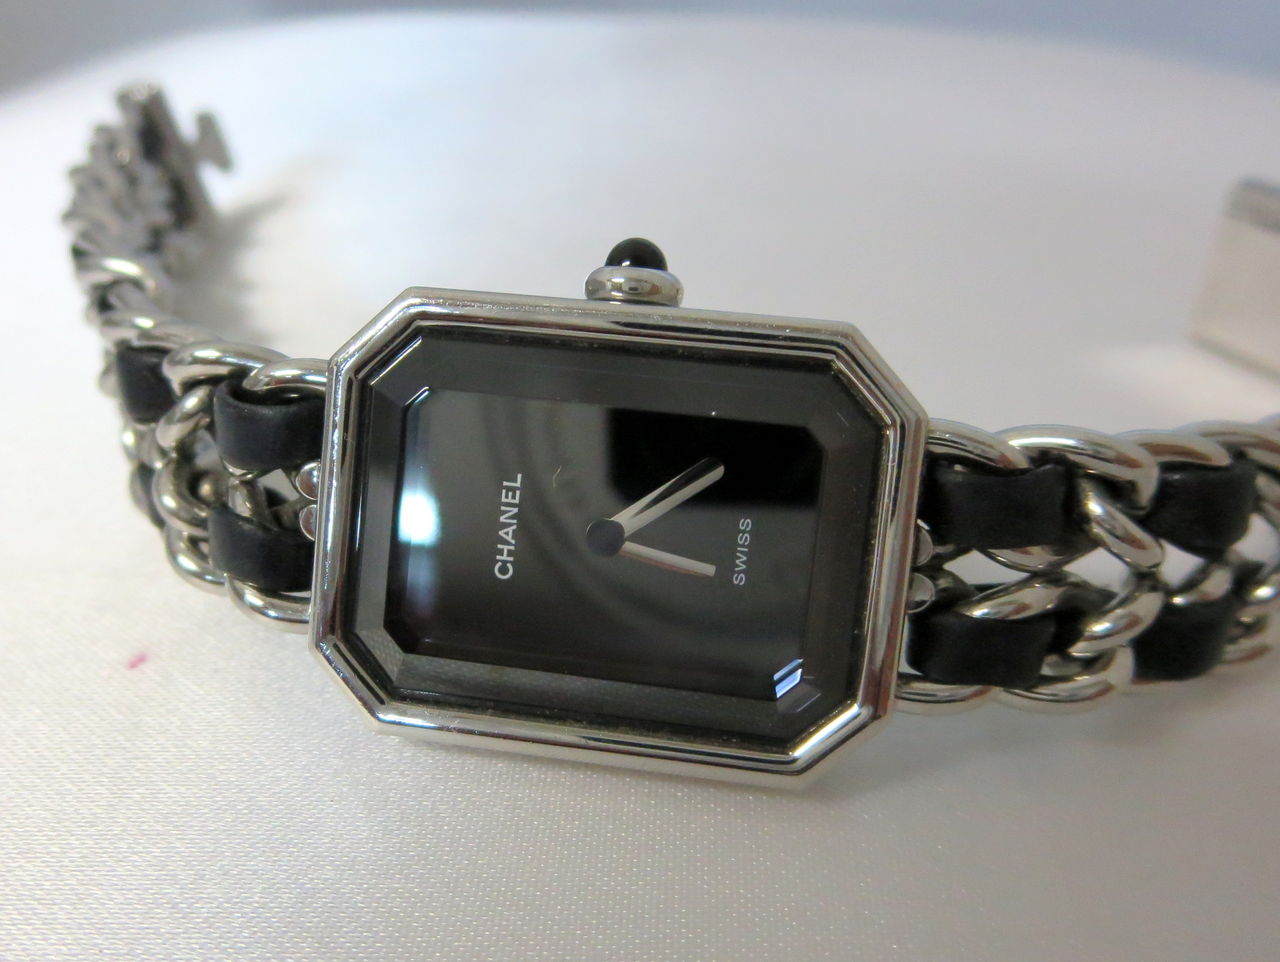 1eca12b6930c 時計クリーニング.COM / ビフォー&アフター : ブランド:シャネル